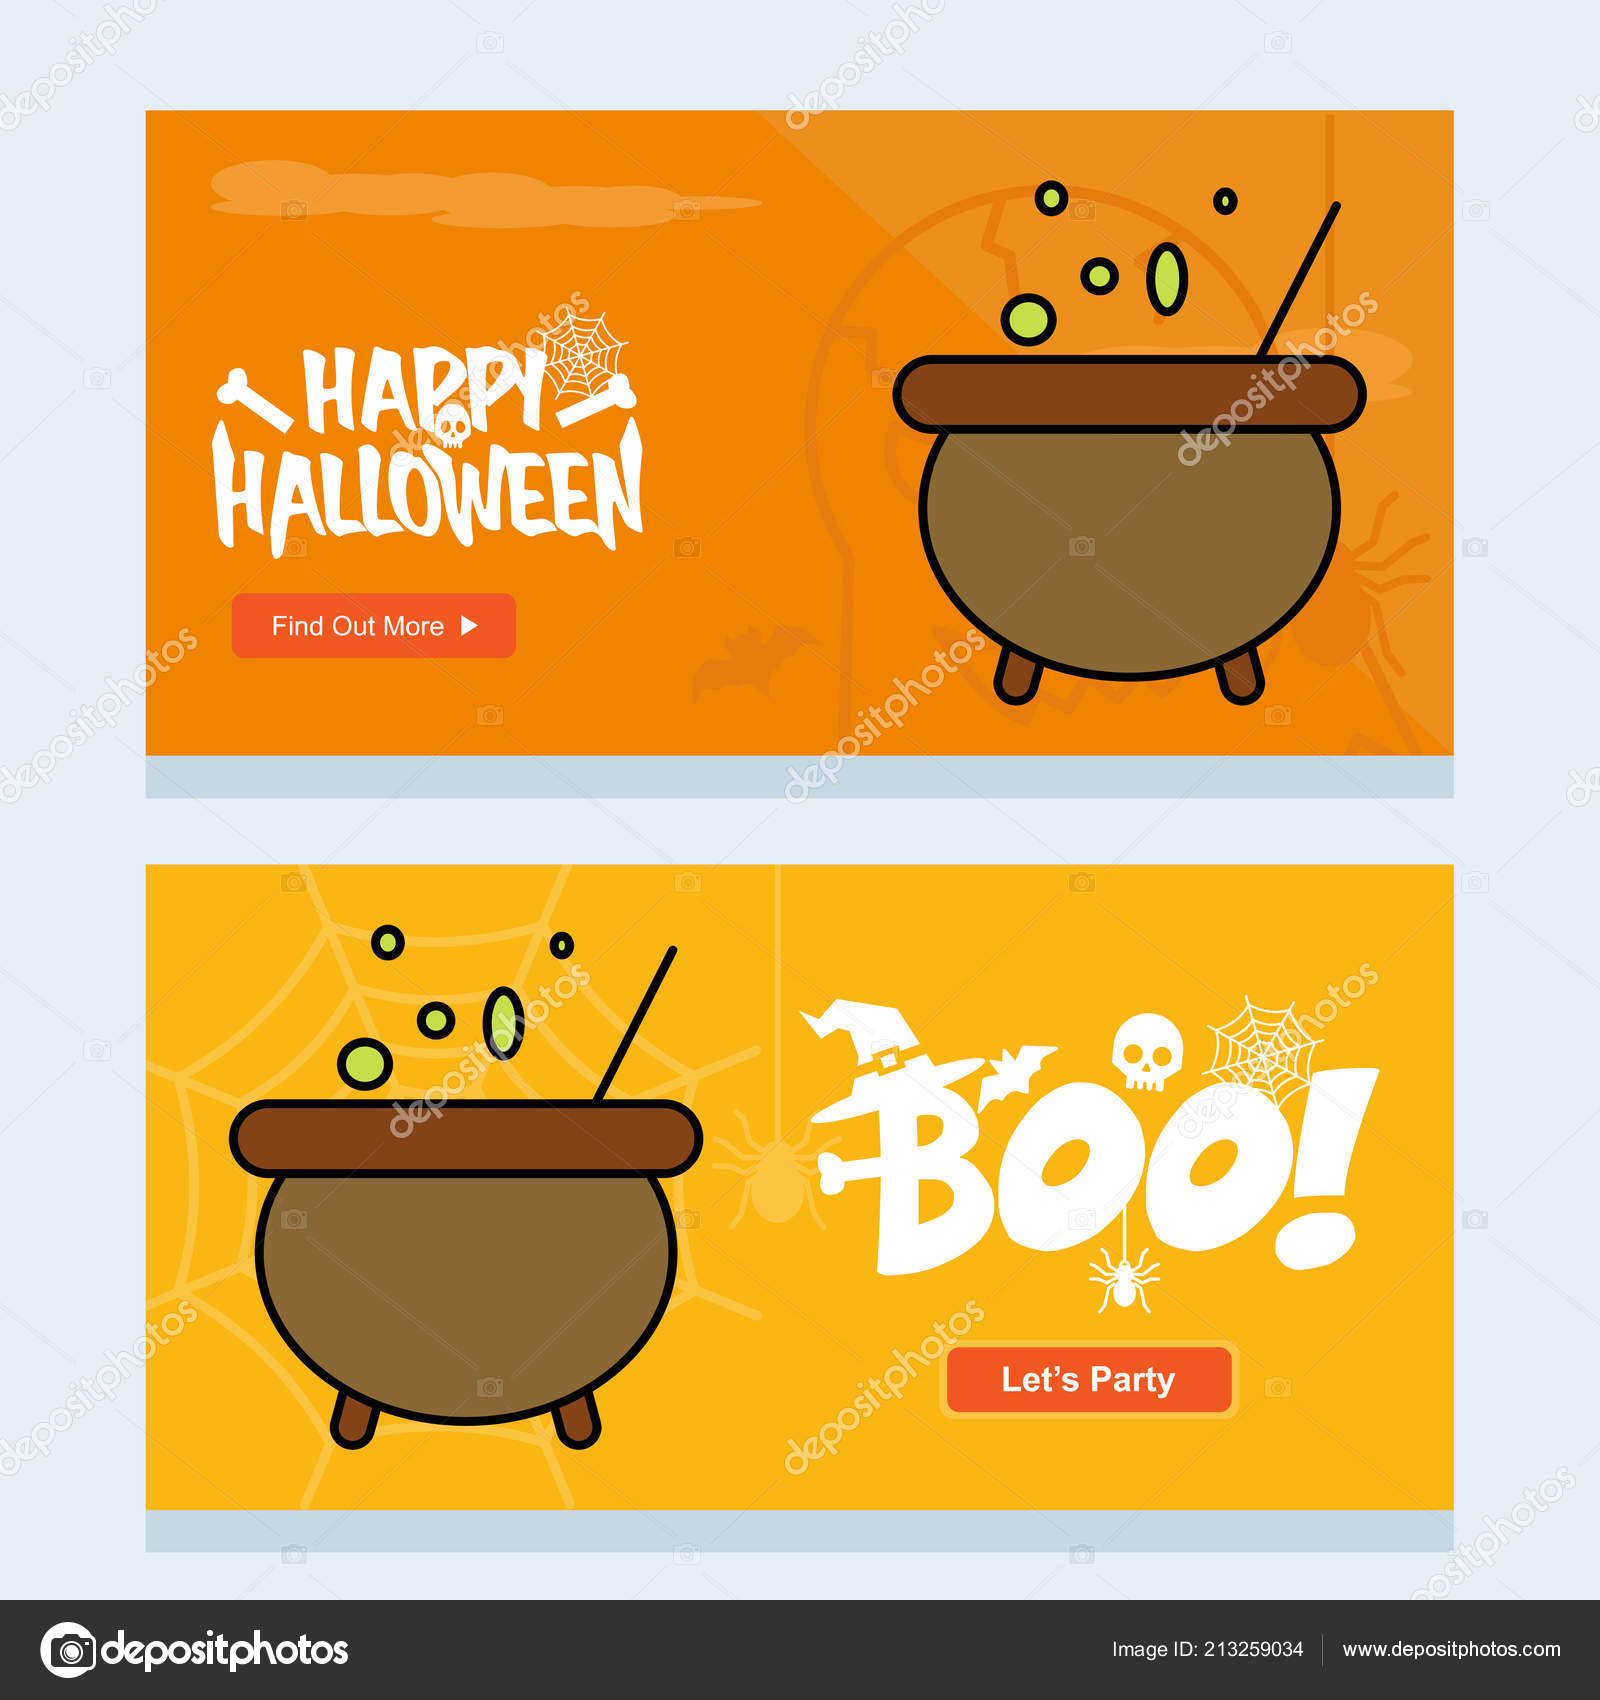 Happy halloween invitation design with pot vector vetor de stock happy halloween invitation design with pot vector vetor de stock stopboris Gallery